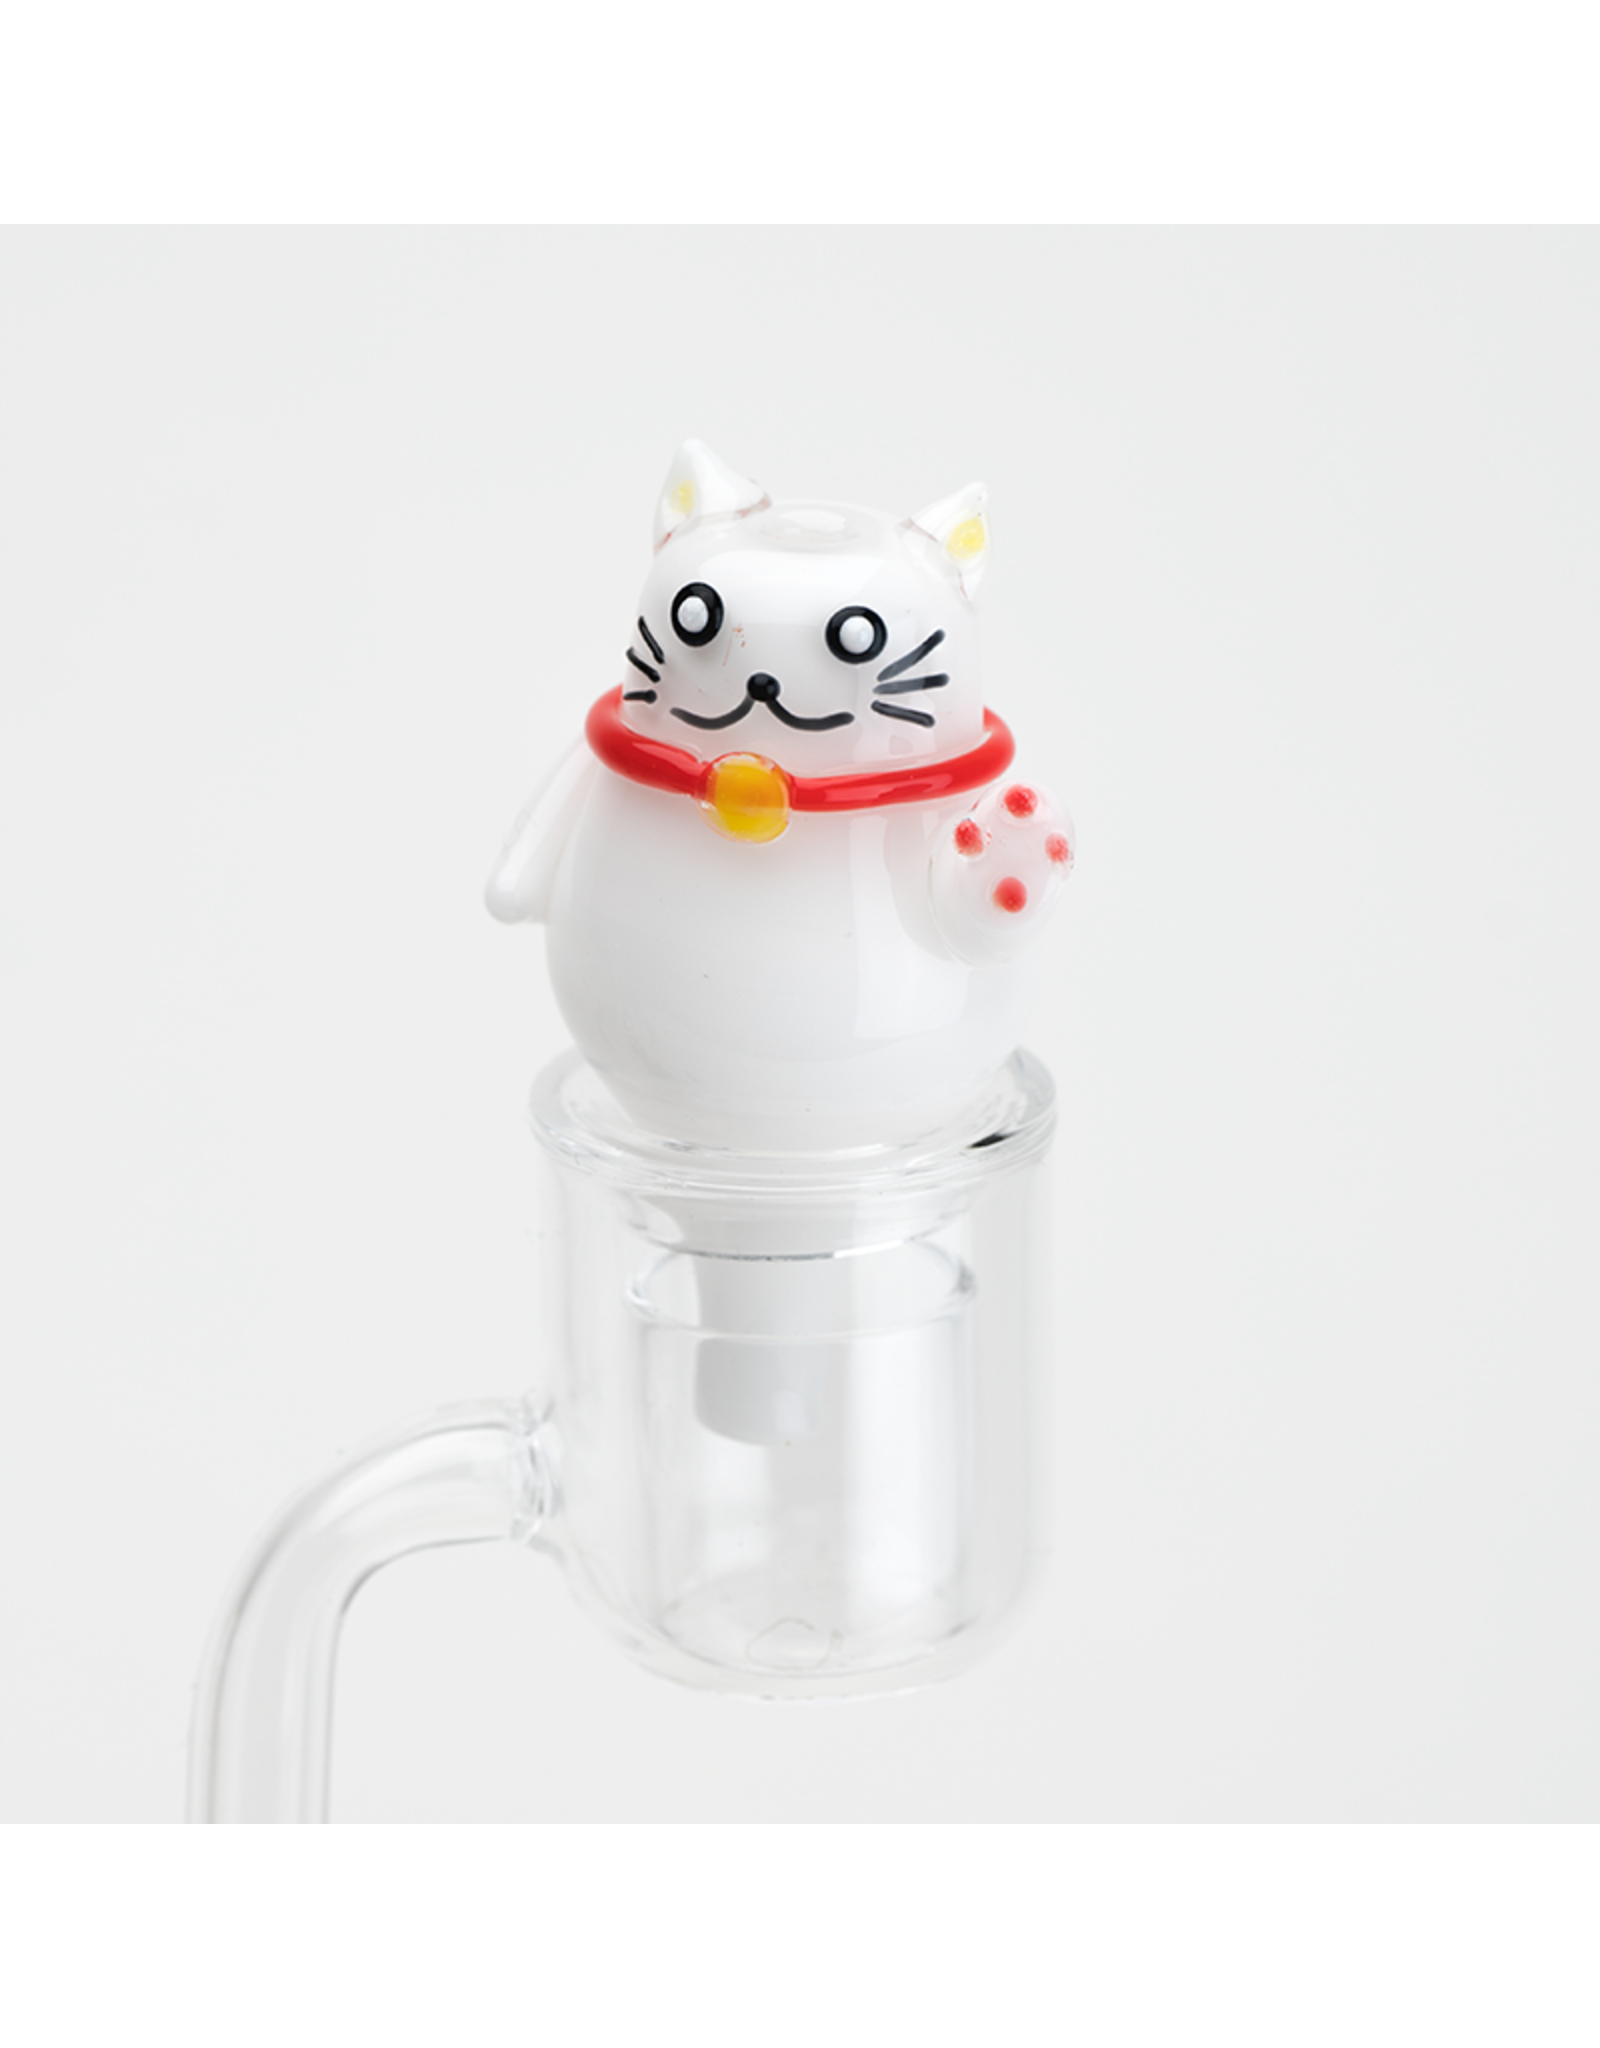 Empire Glass Zen Kitty Bubble Carb Cap